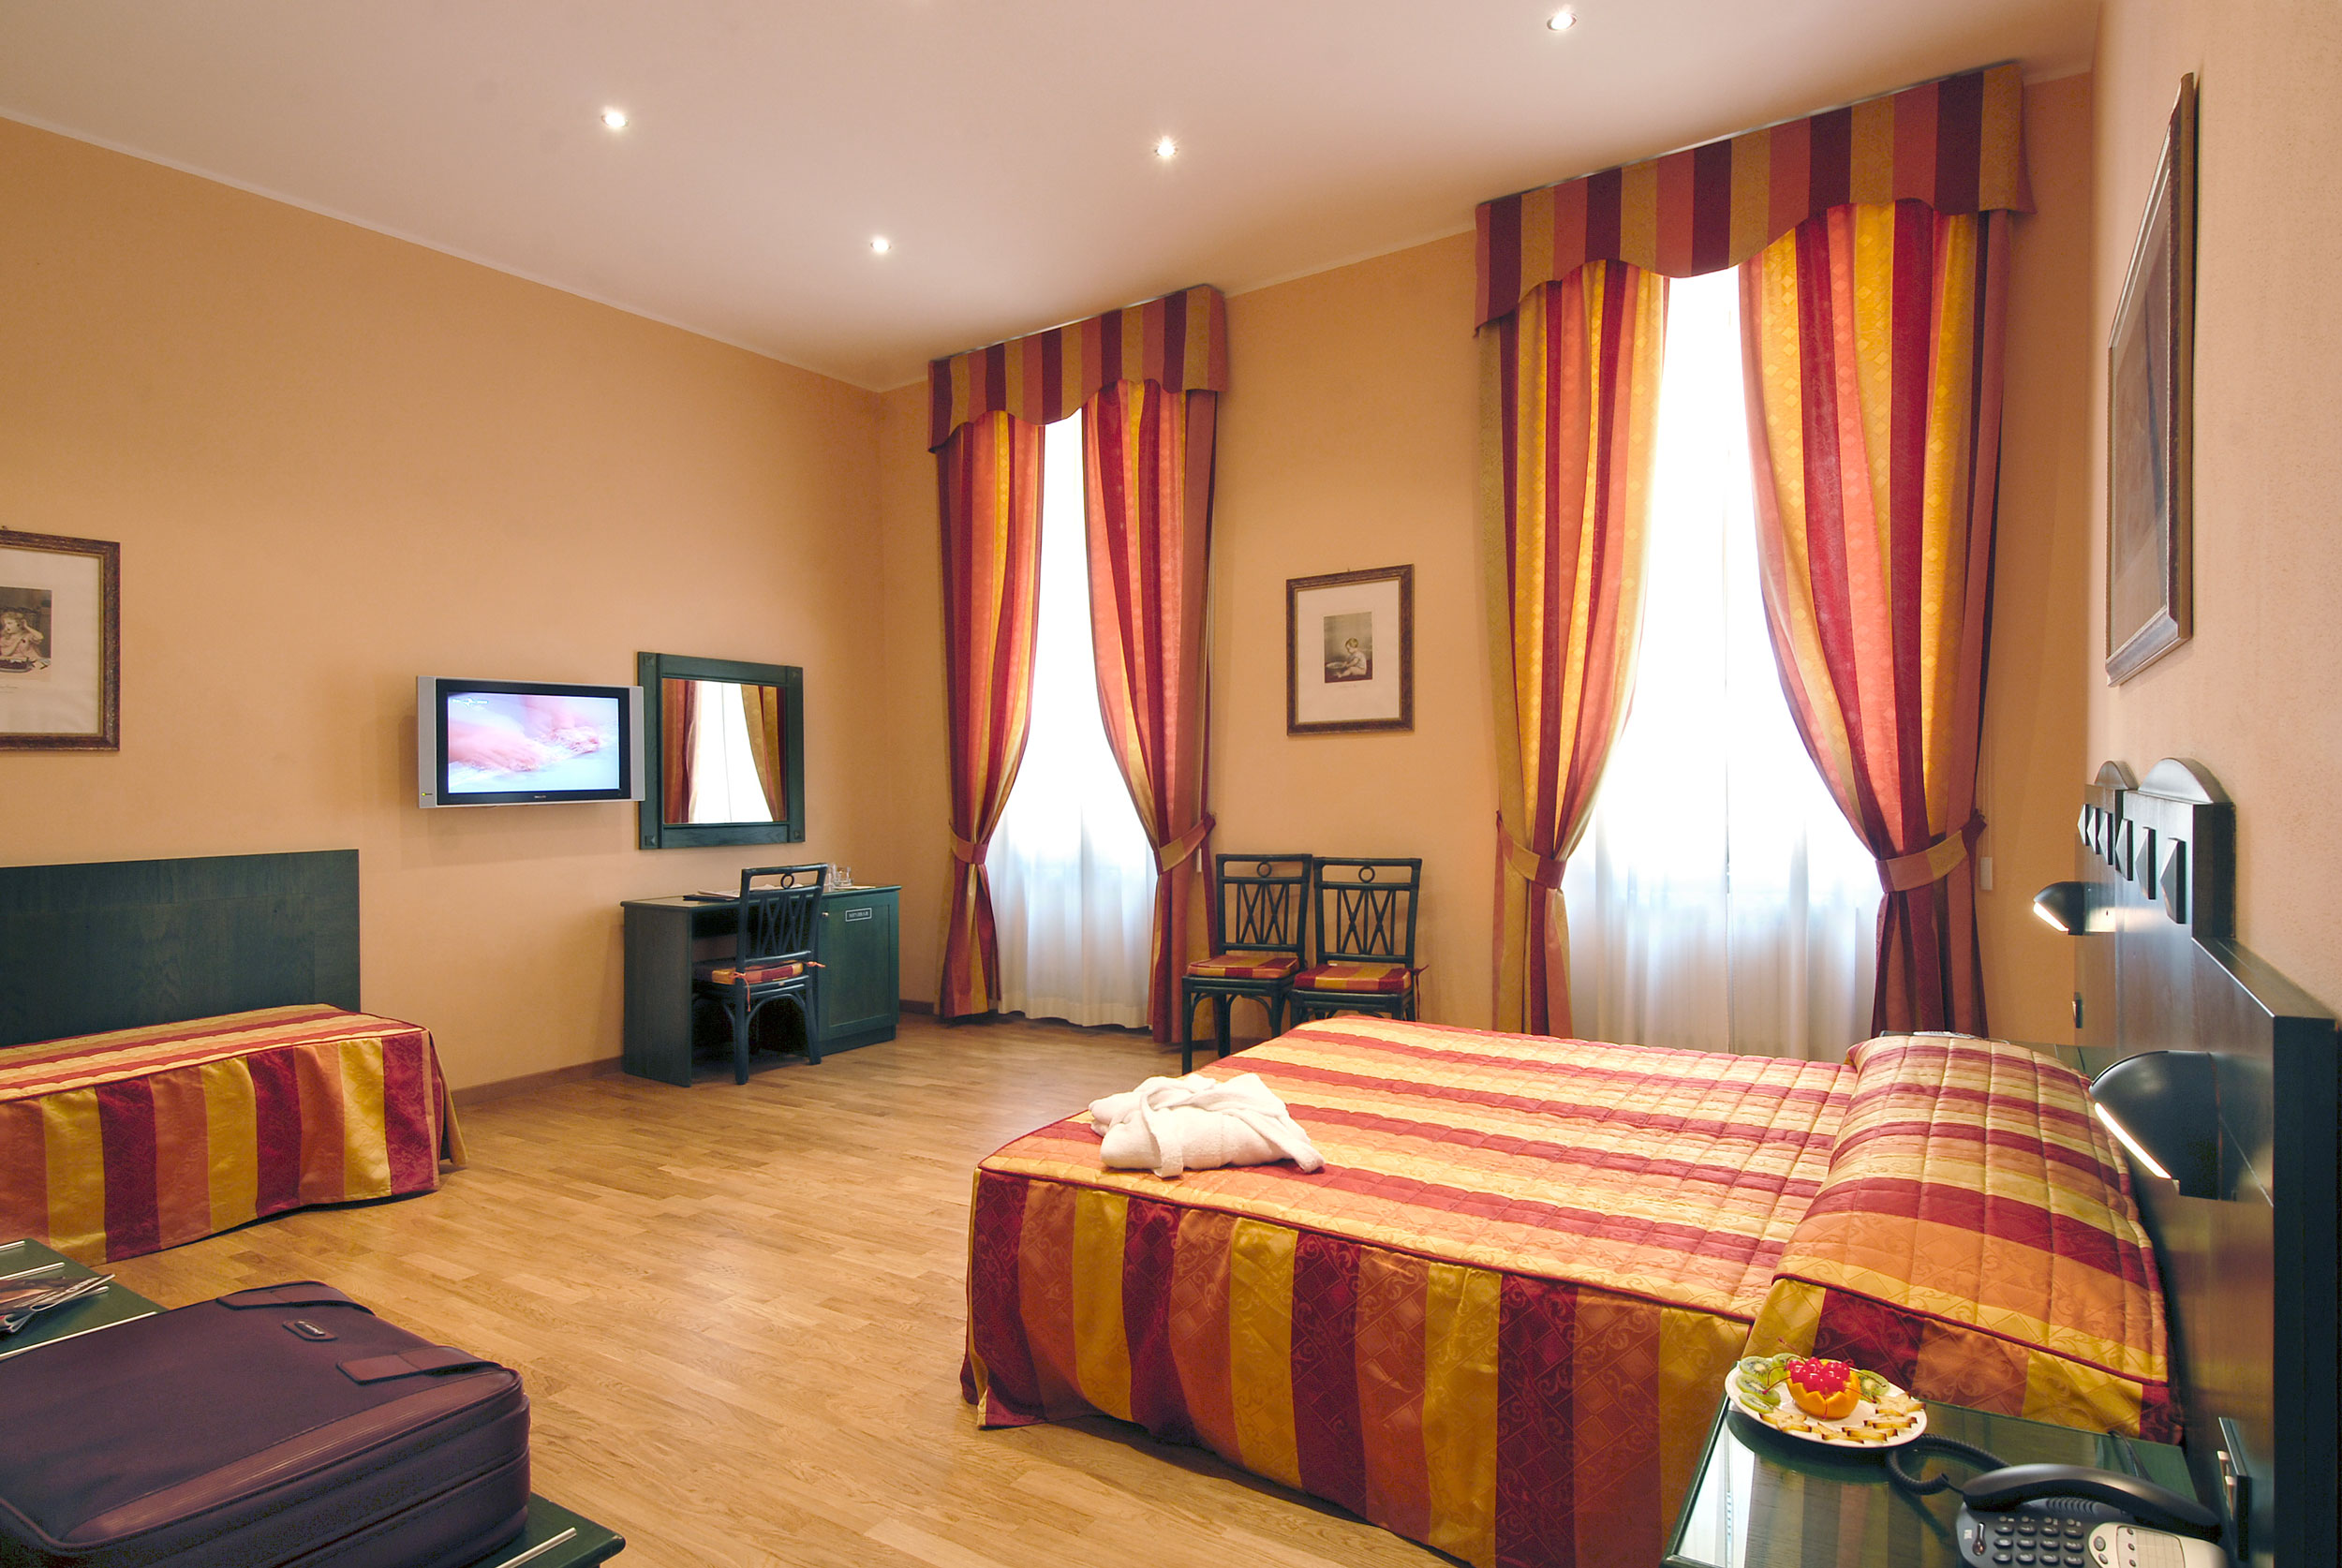 Hotel pisa hotel pisa 4 stelle parking hotel bologna for Hotel meilleur